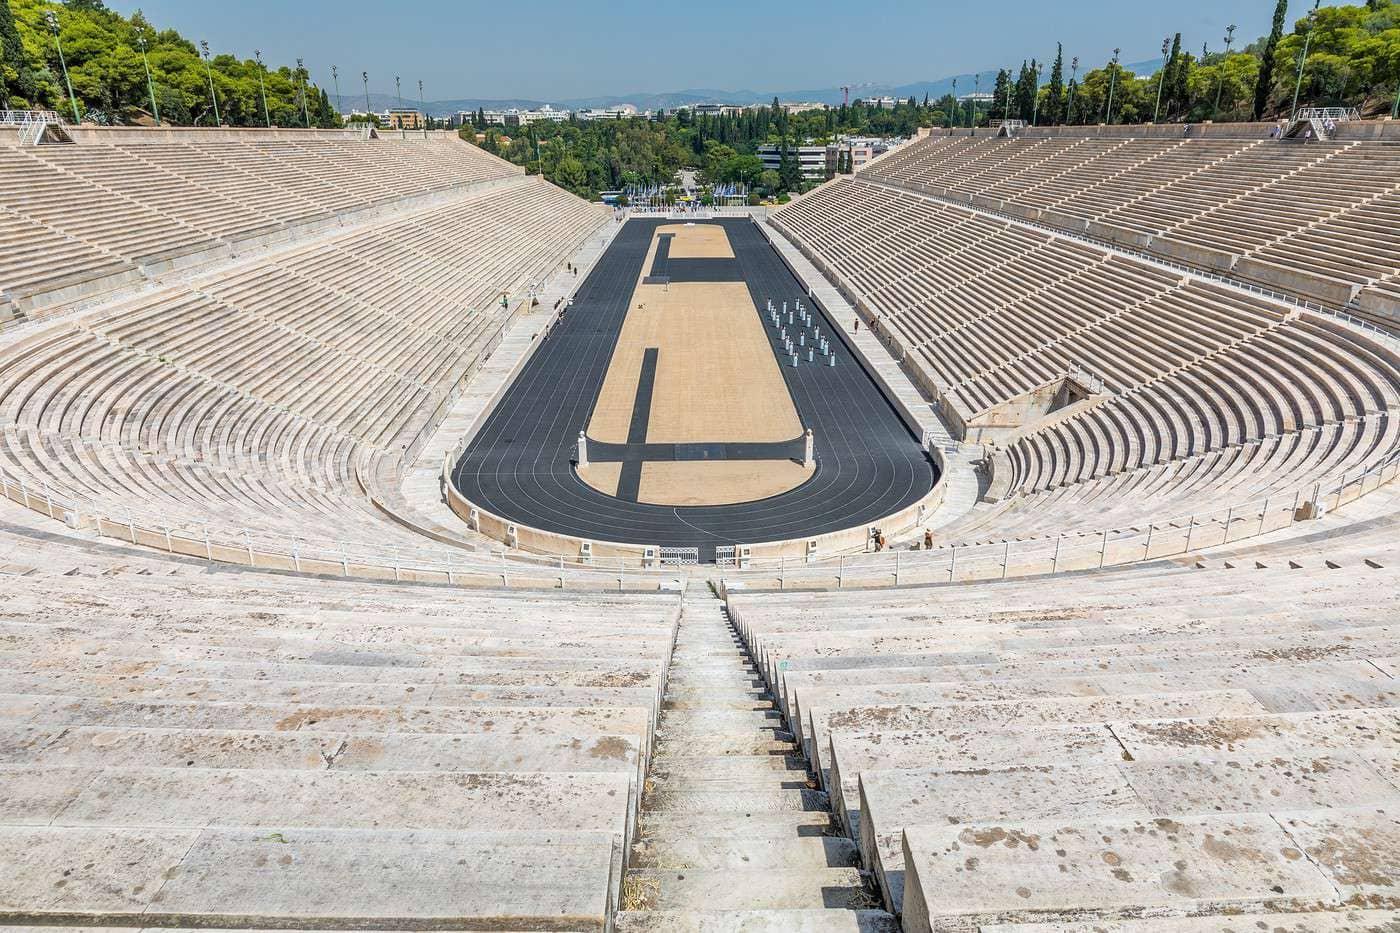 visite-stade-athenes